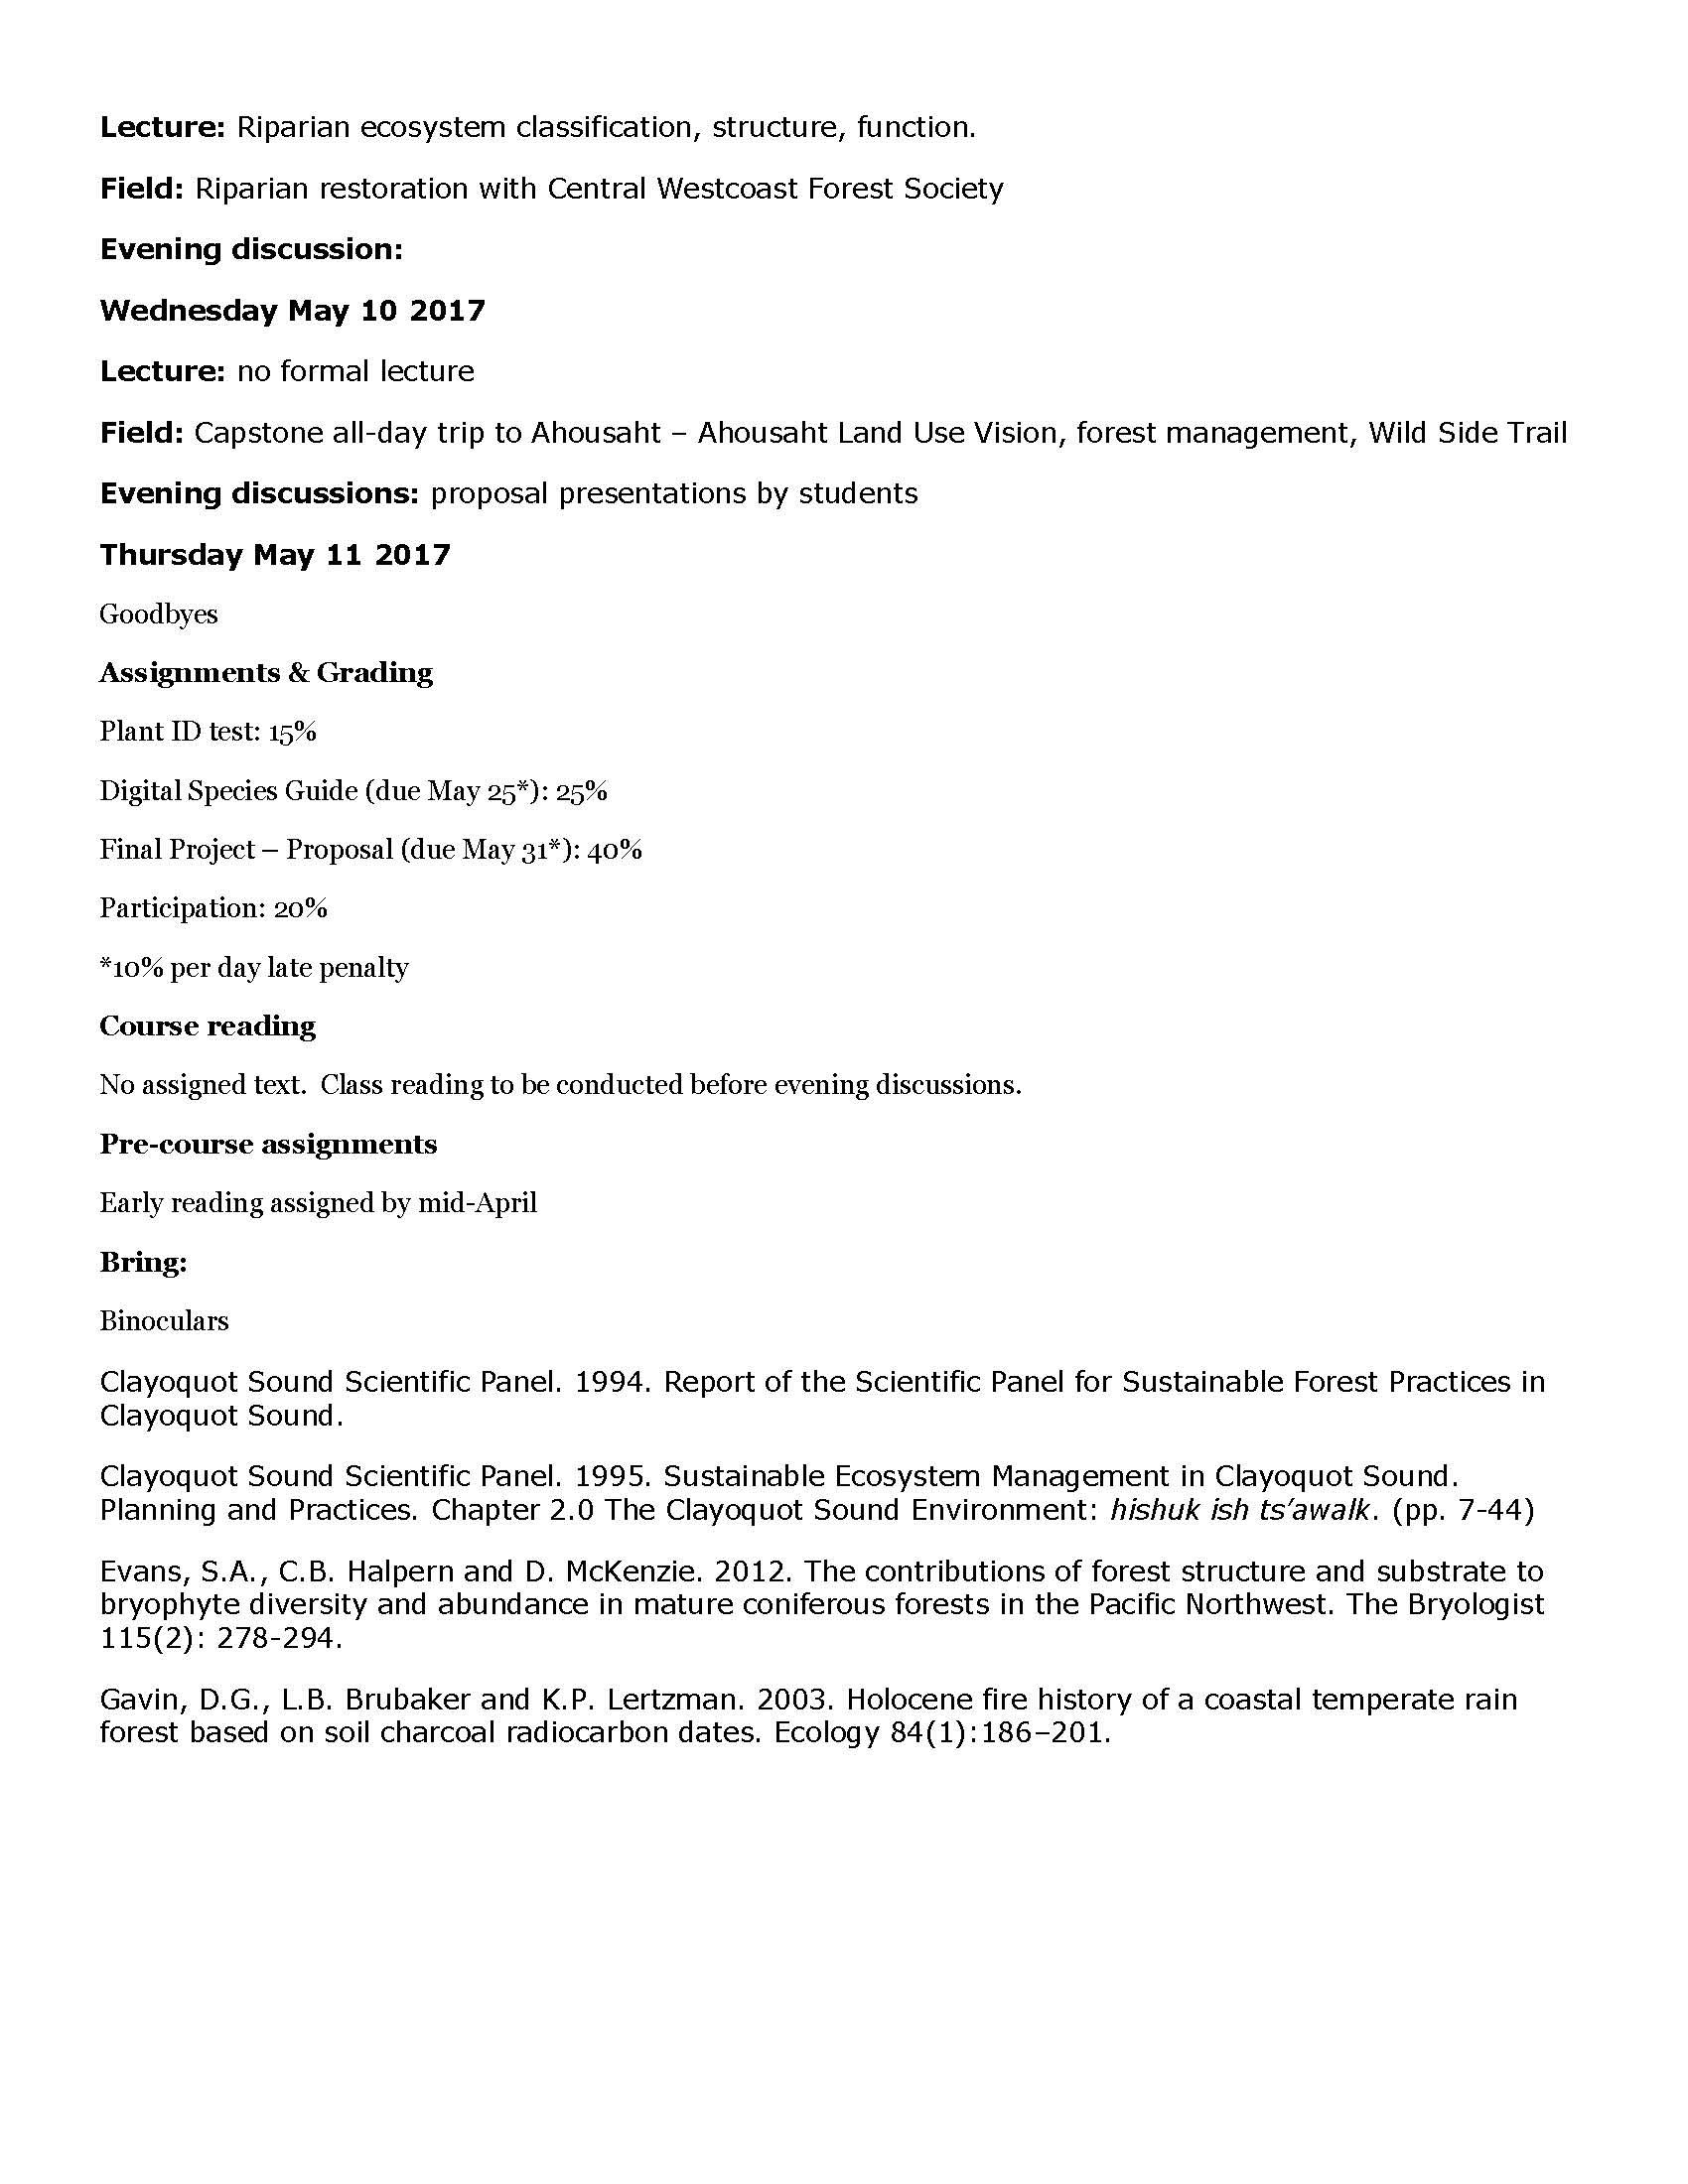 TFN Bulletin March 1 2017_Page_18.jpg